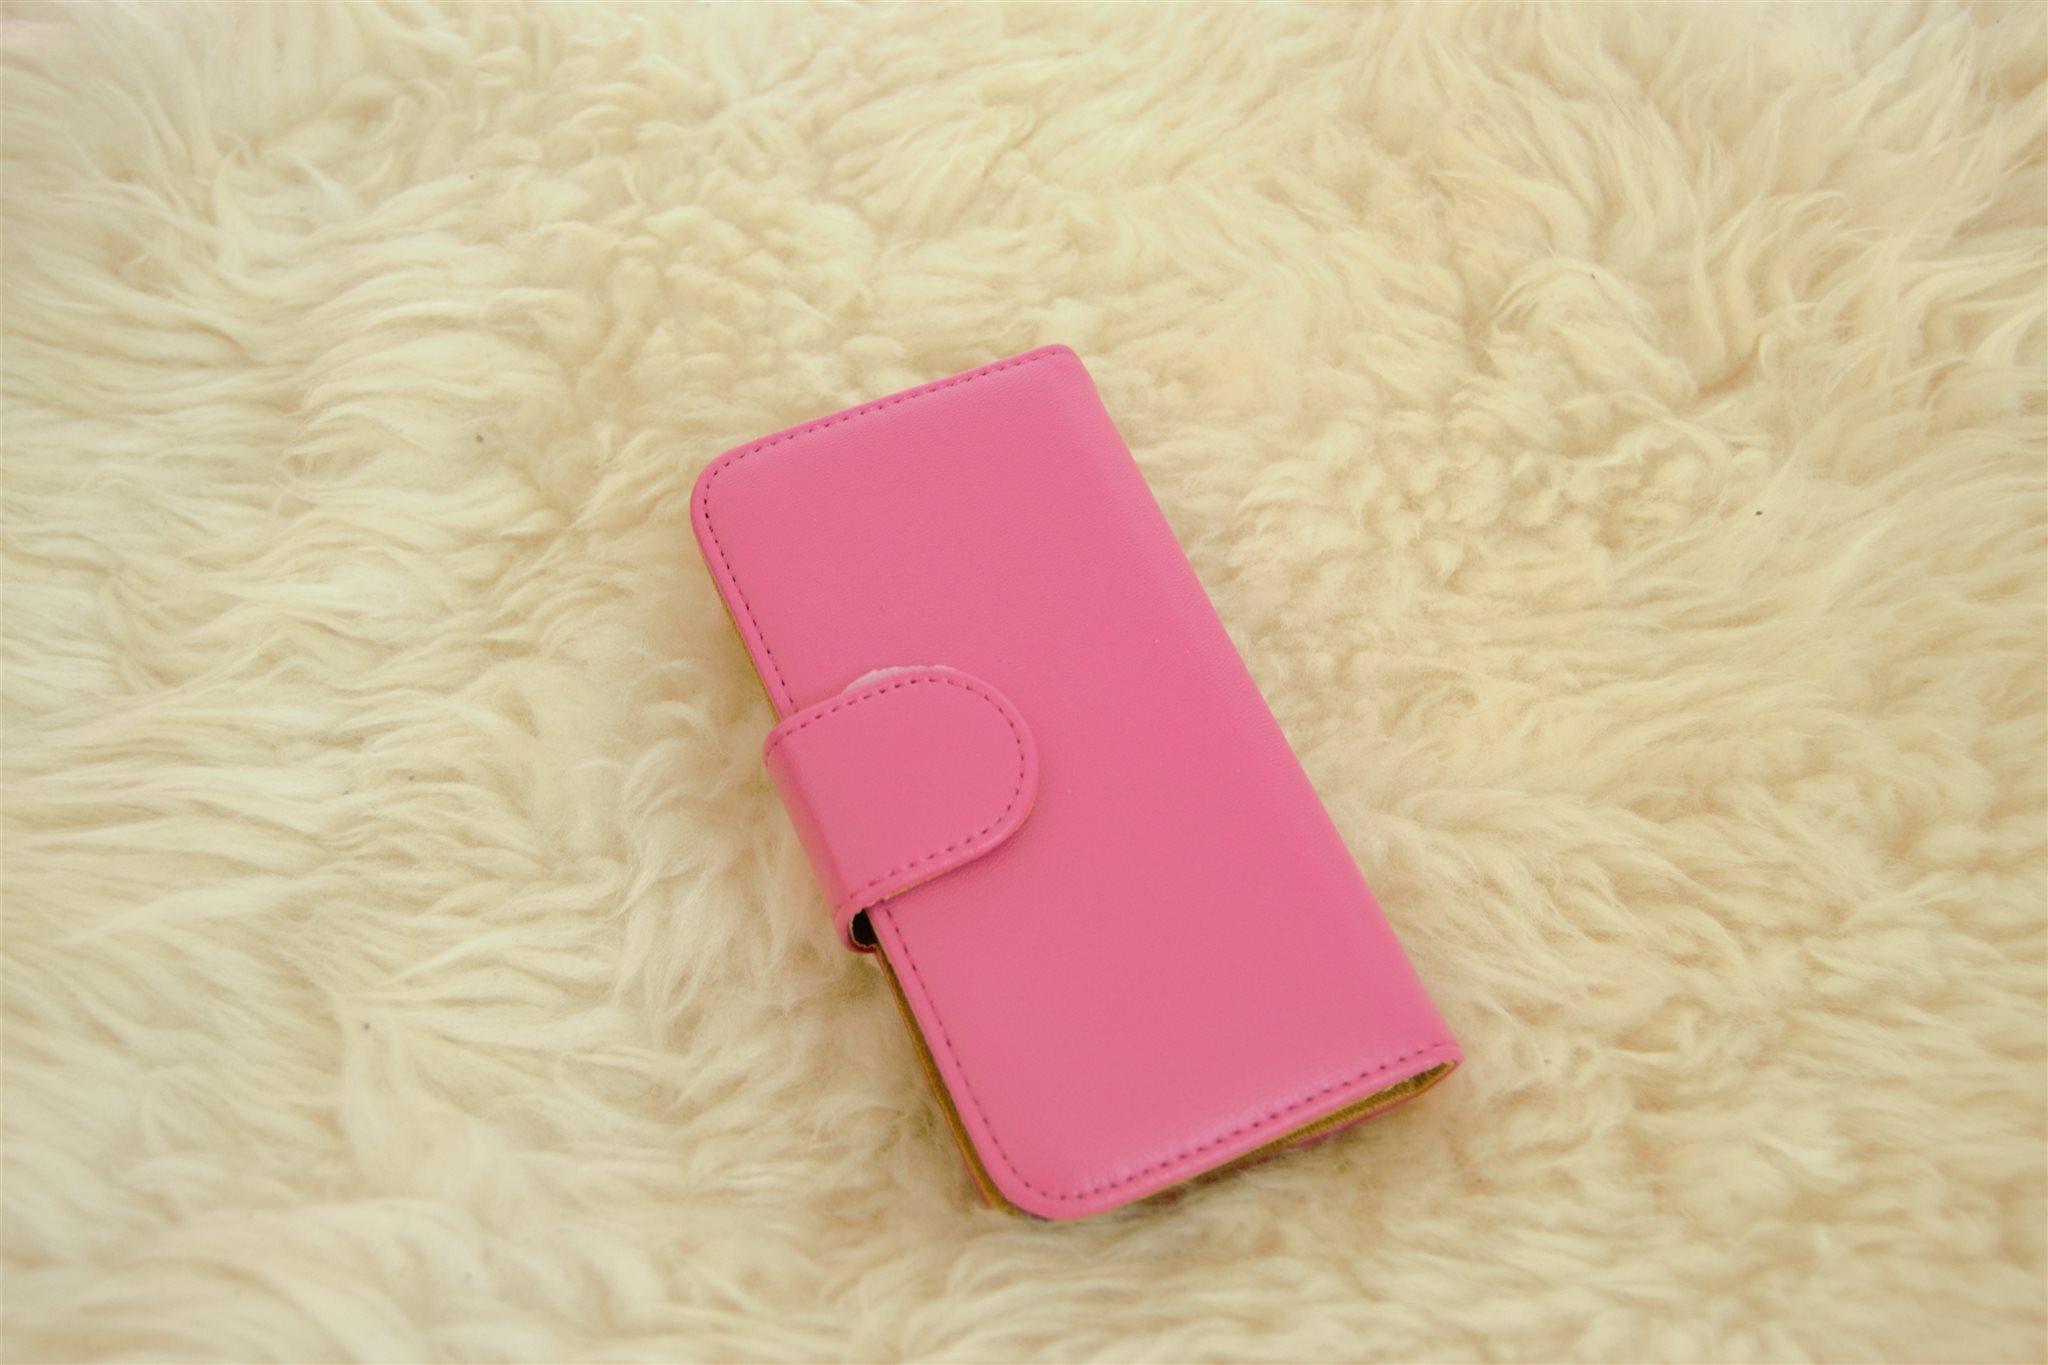 MTU Fordral Till iPhone 5   SE (333105542) ᐈ Köp på Tradera 3503211346d4e